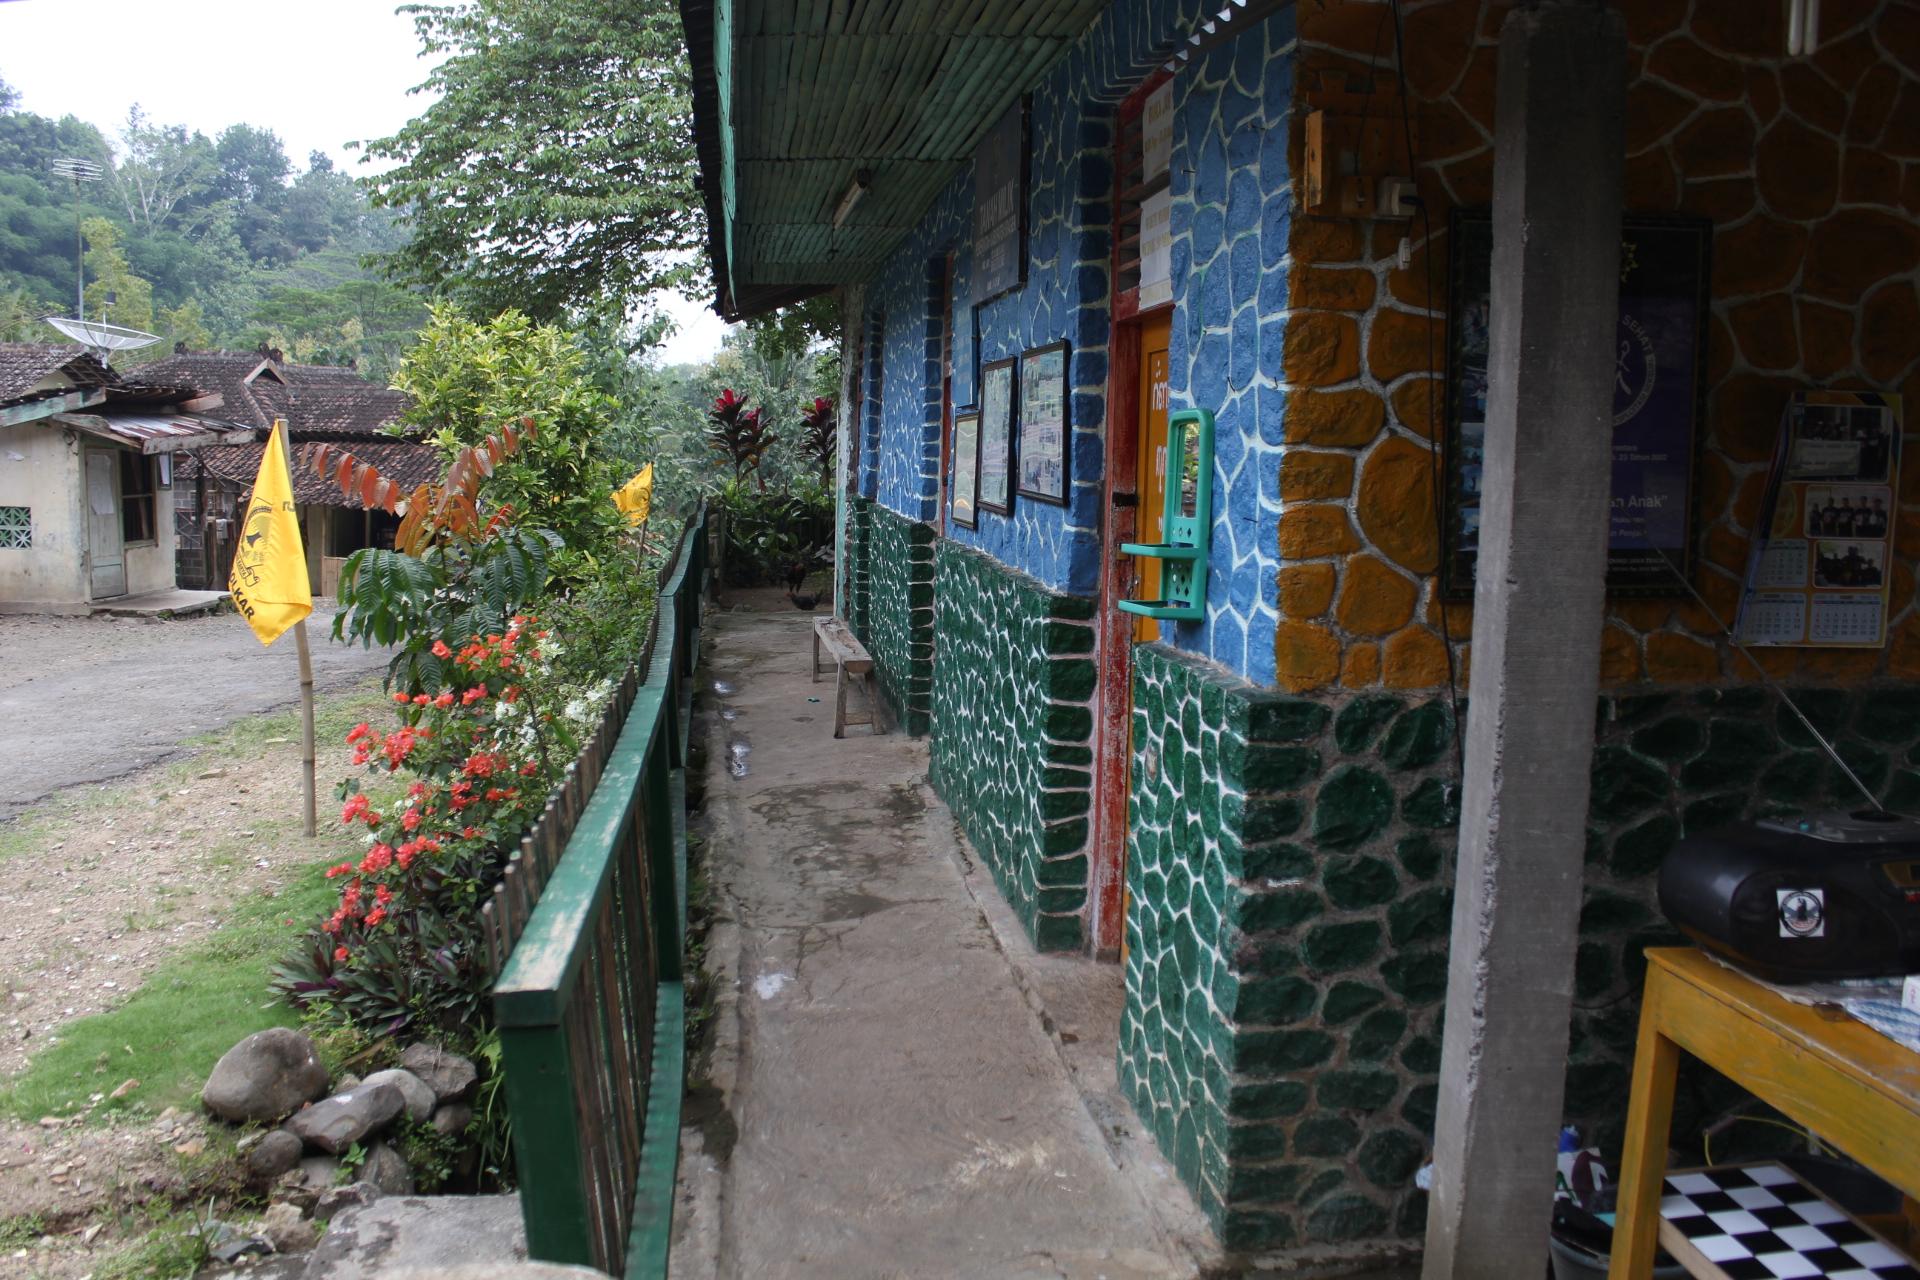 Destinasi Pariwisata Sragen Google Wisata Makam Joko Tingkir Kab